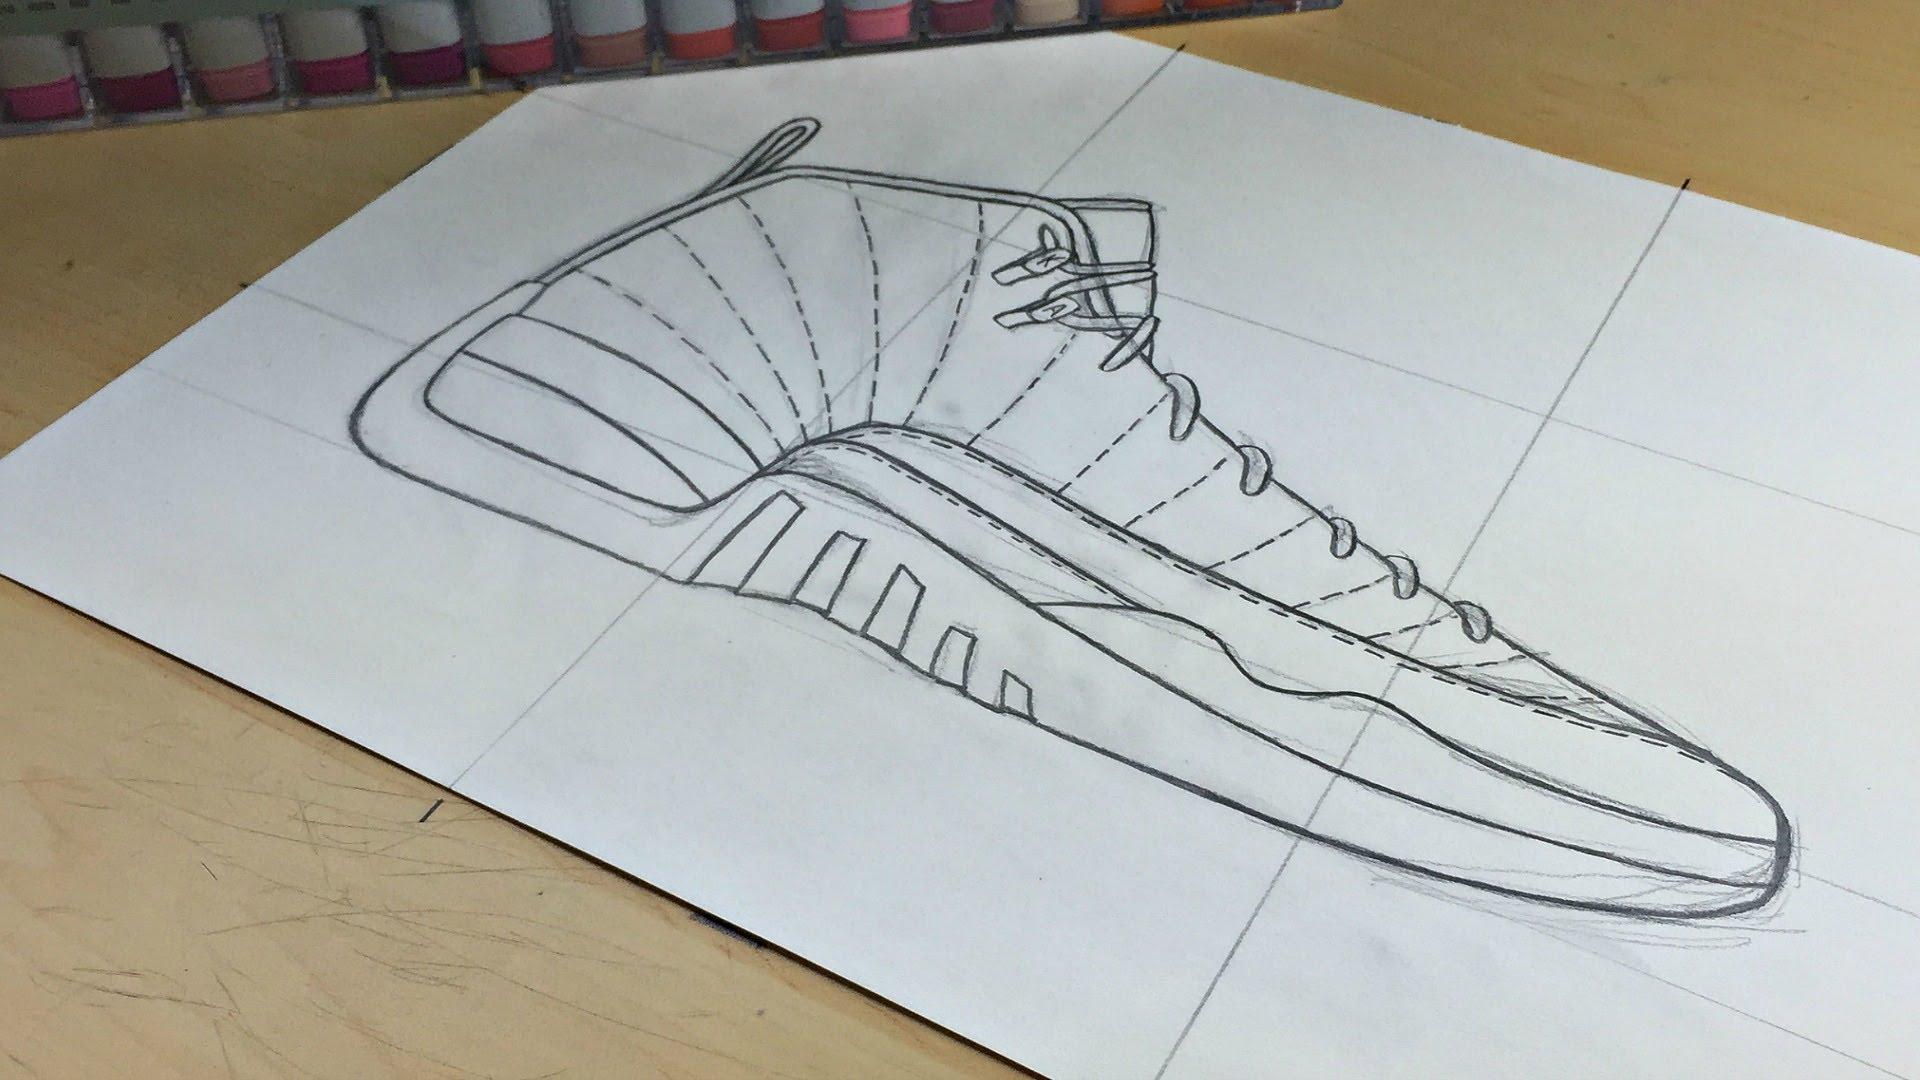 Drawn shoe air jordan shoe Air w/ Draw: YouTube To